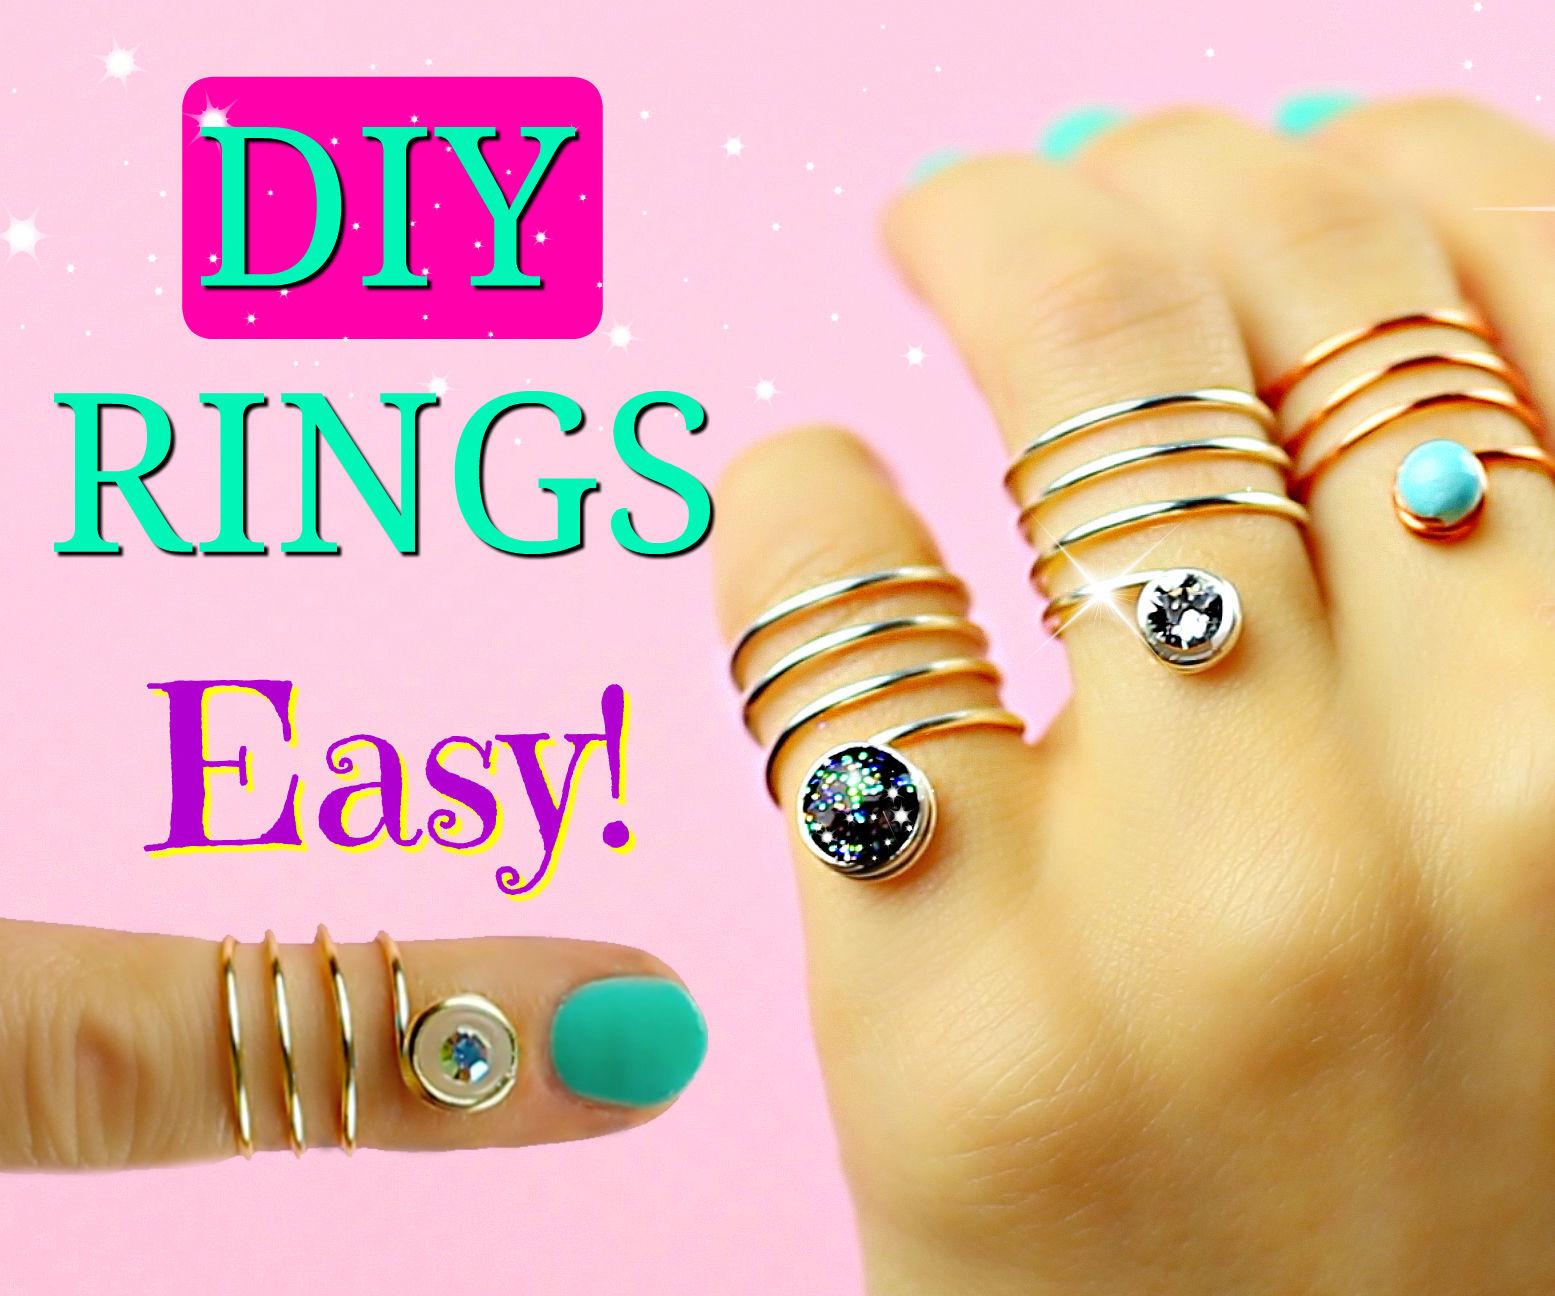 DIY rings - Galaxy, Diamond, Opal.. No Tools!